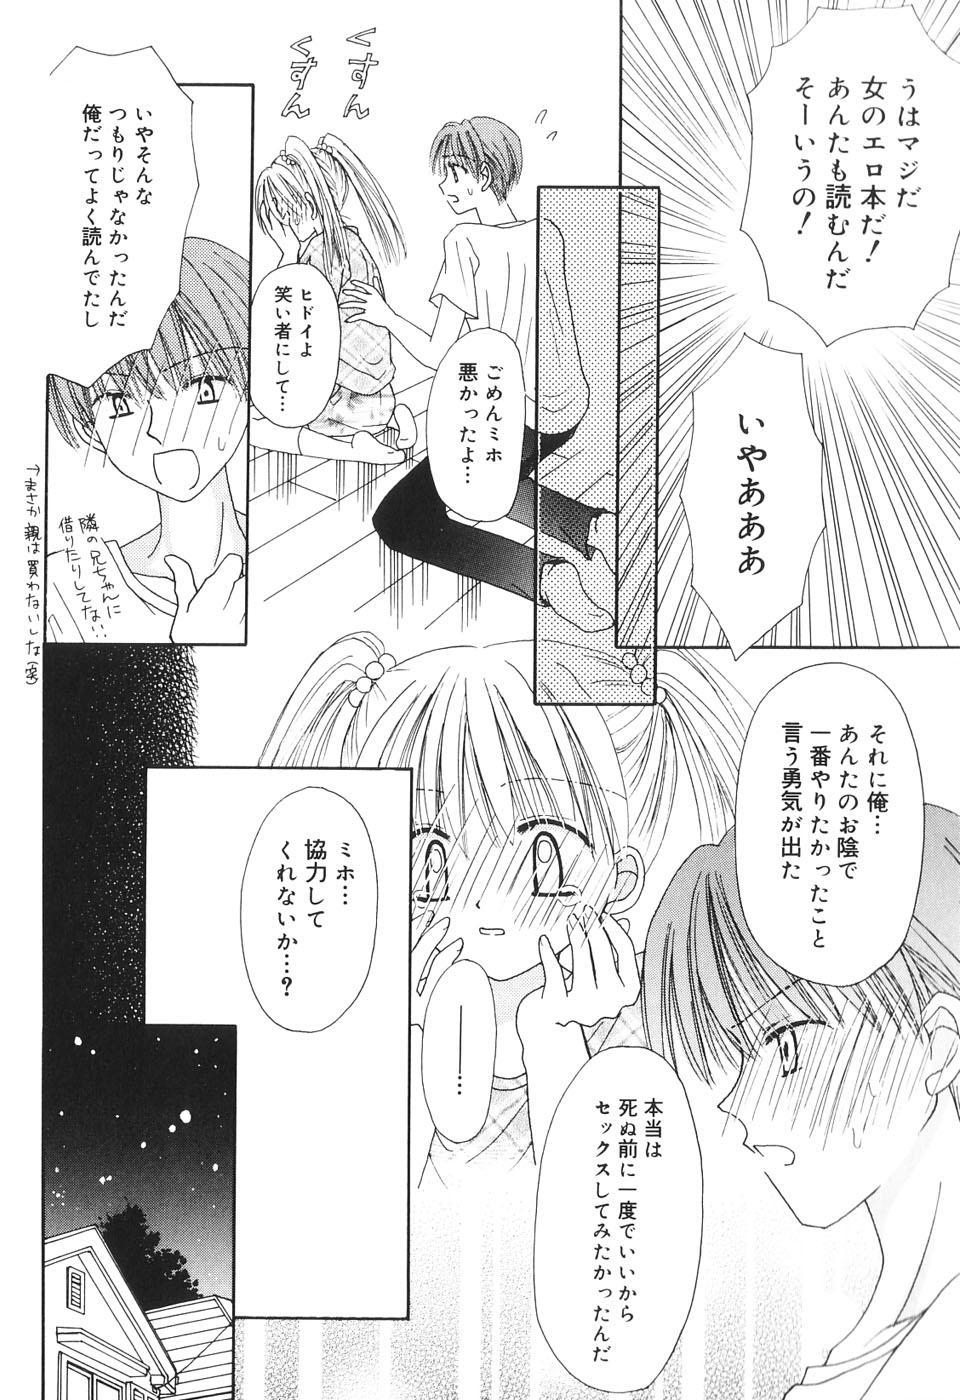 Musoubana 64